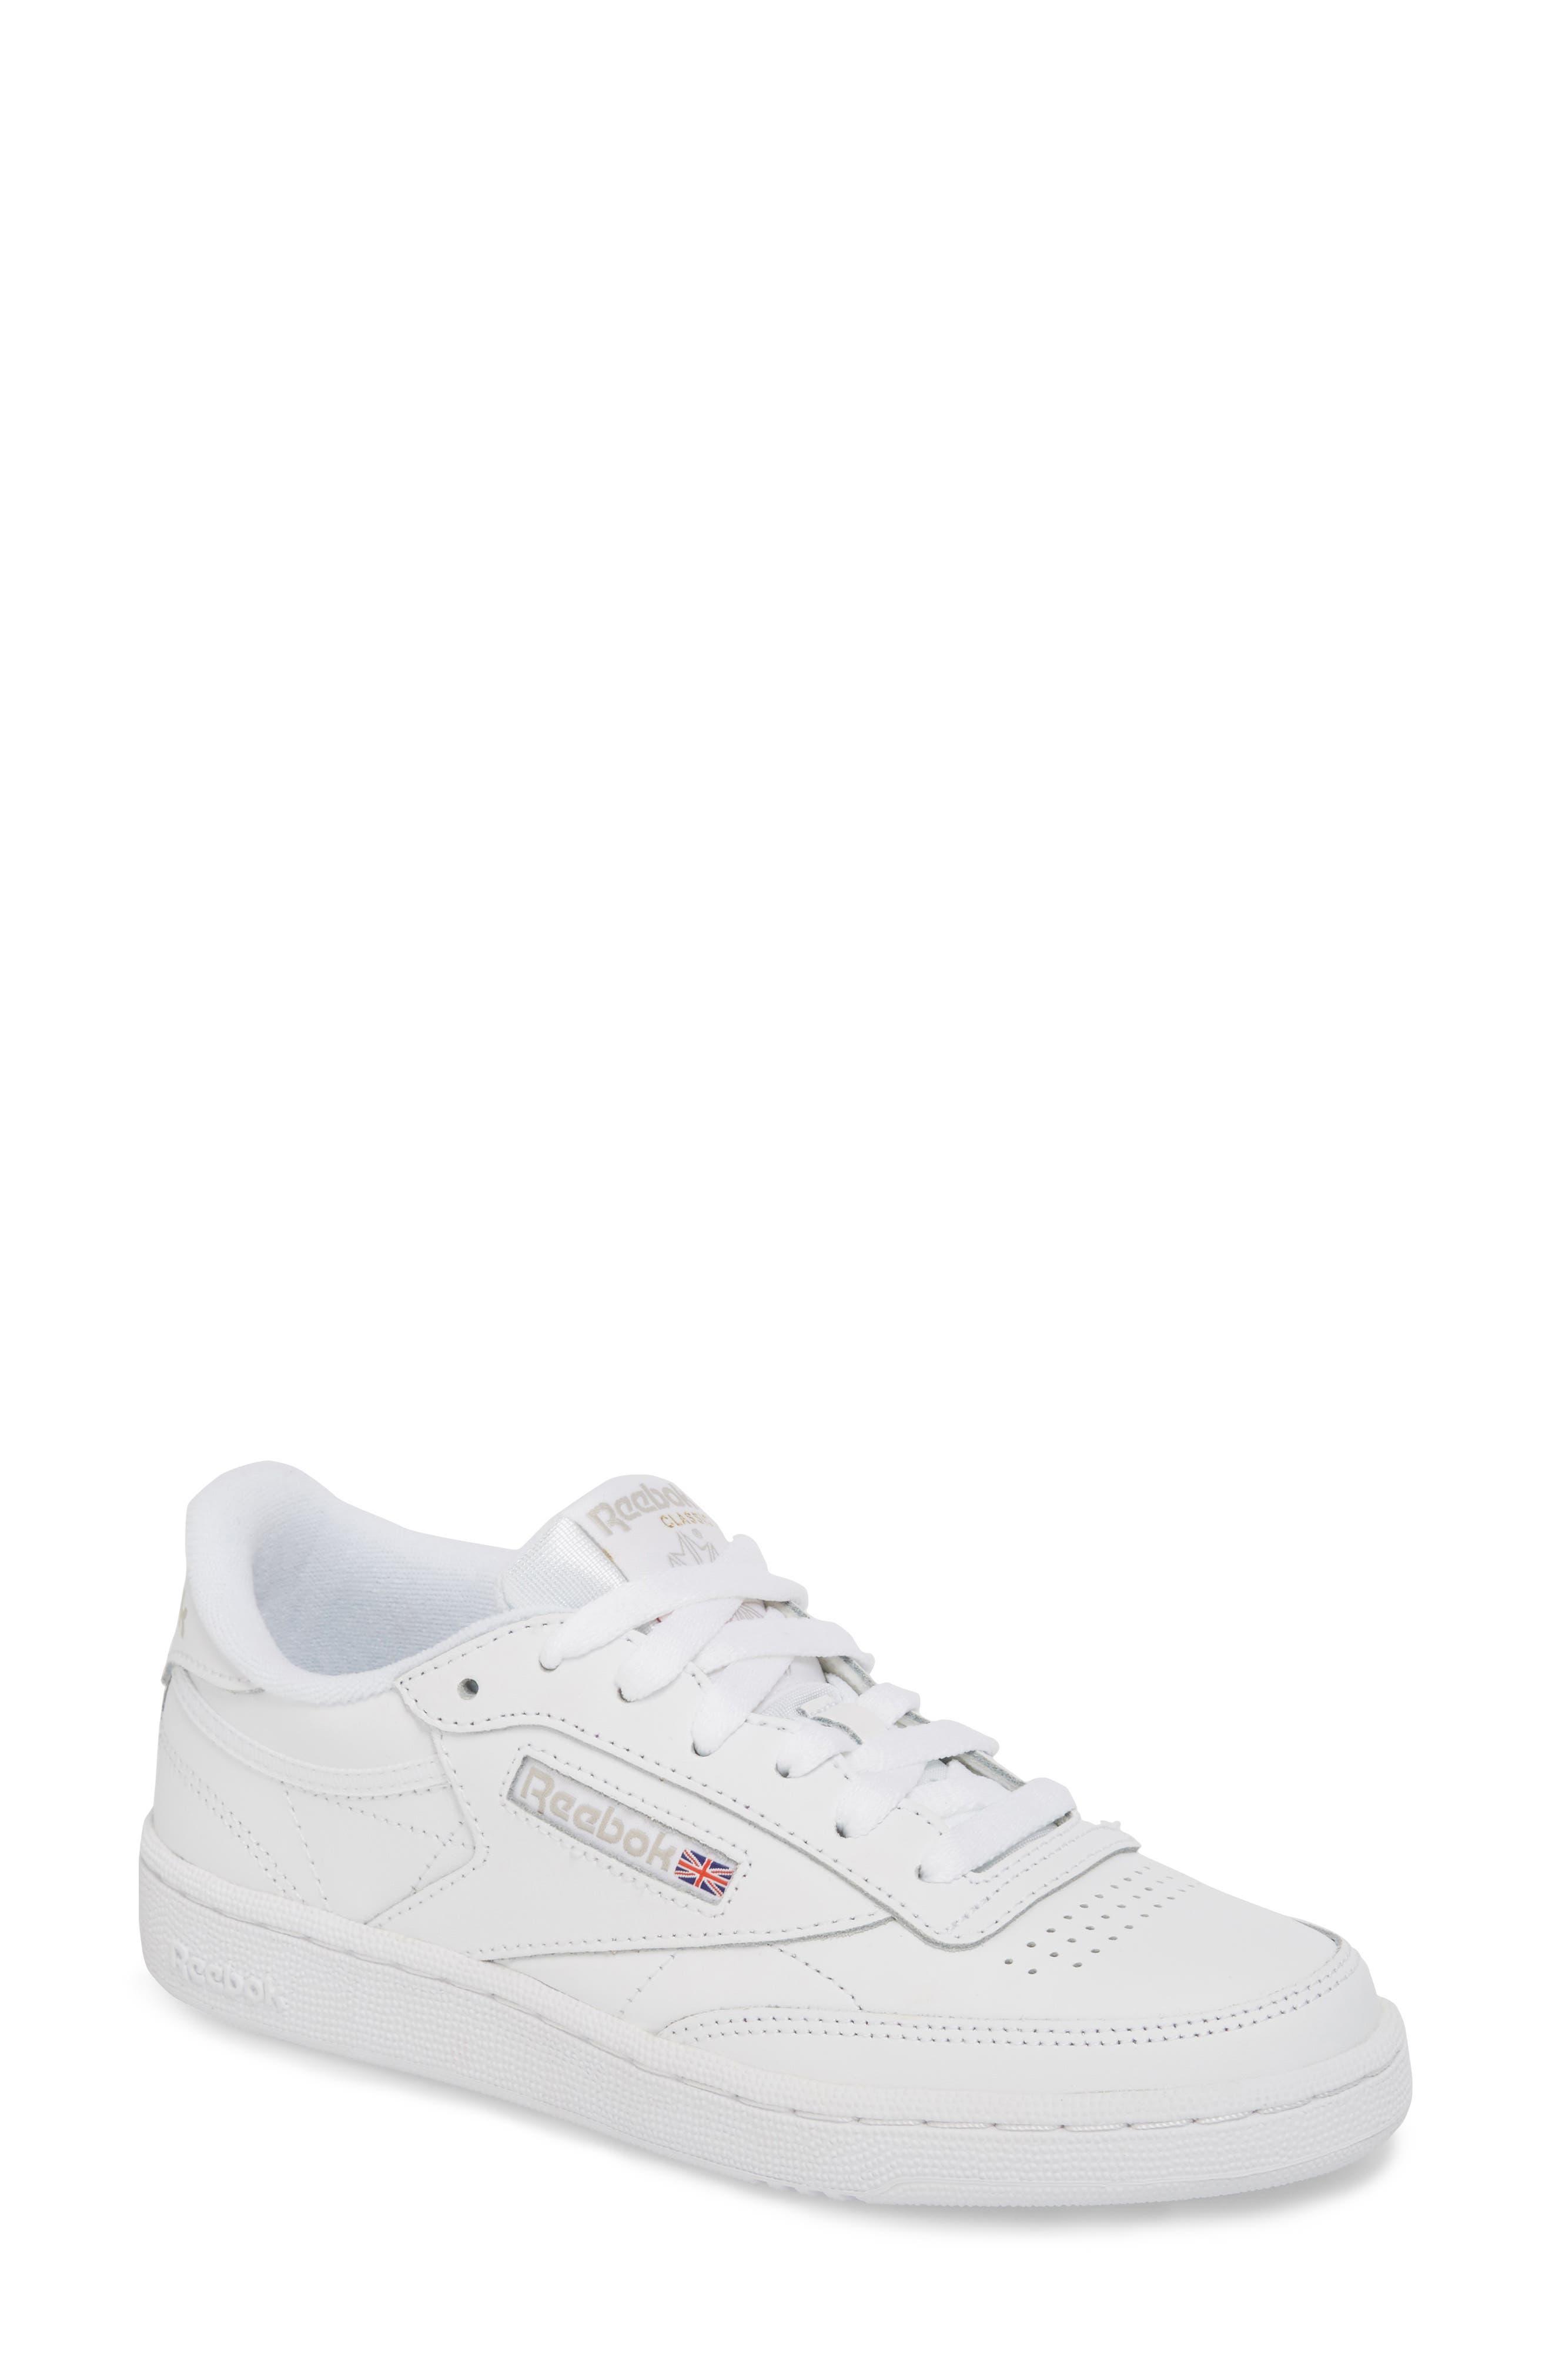 Club C 85 Sneaker,                         Main,                         color, WHITE/ LIGHT GREY